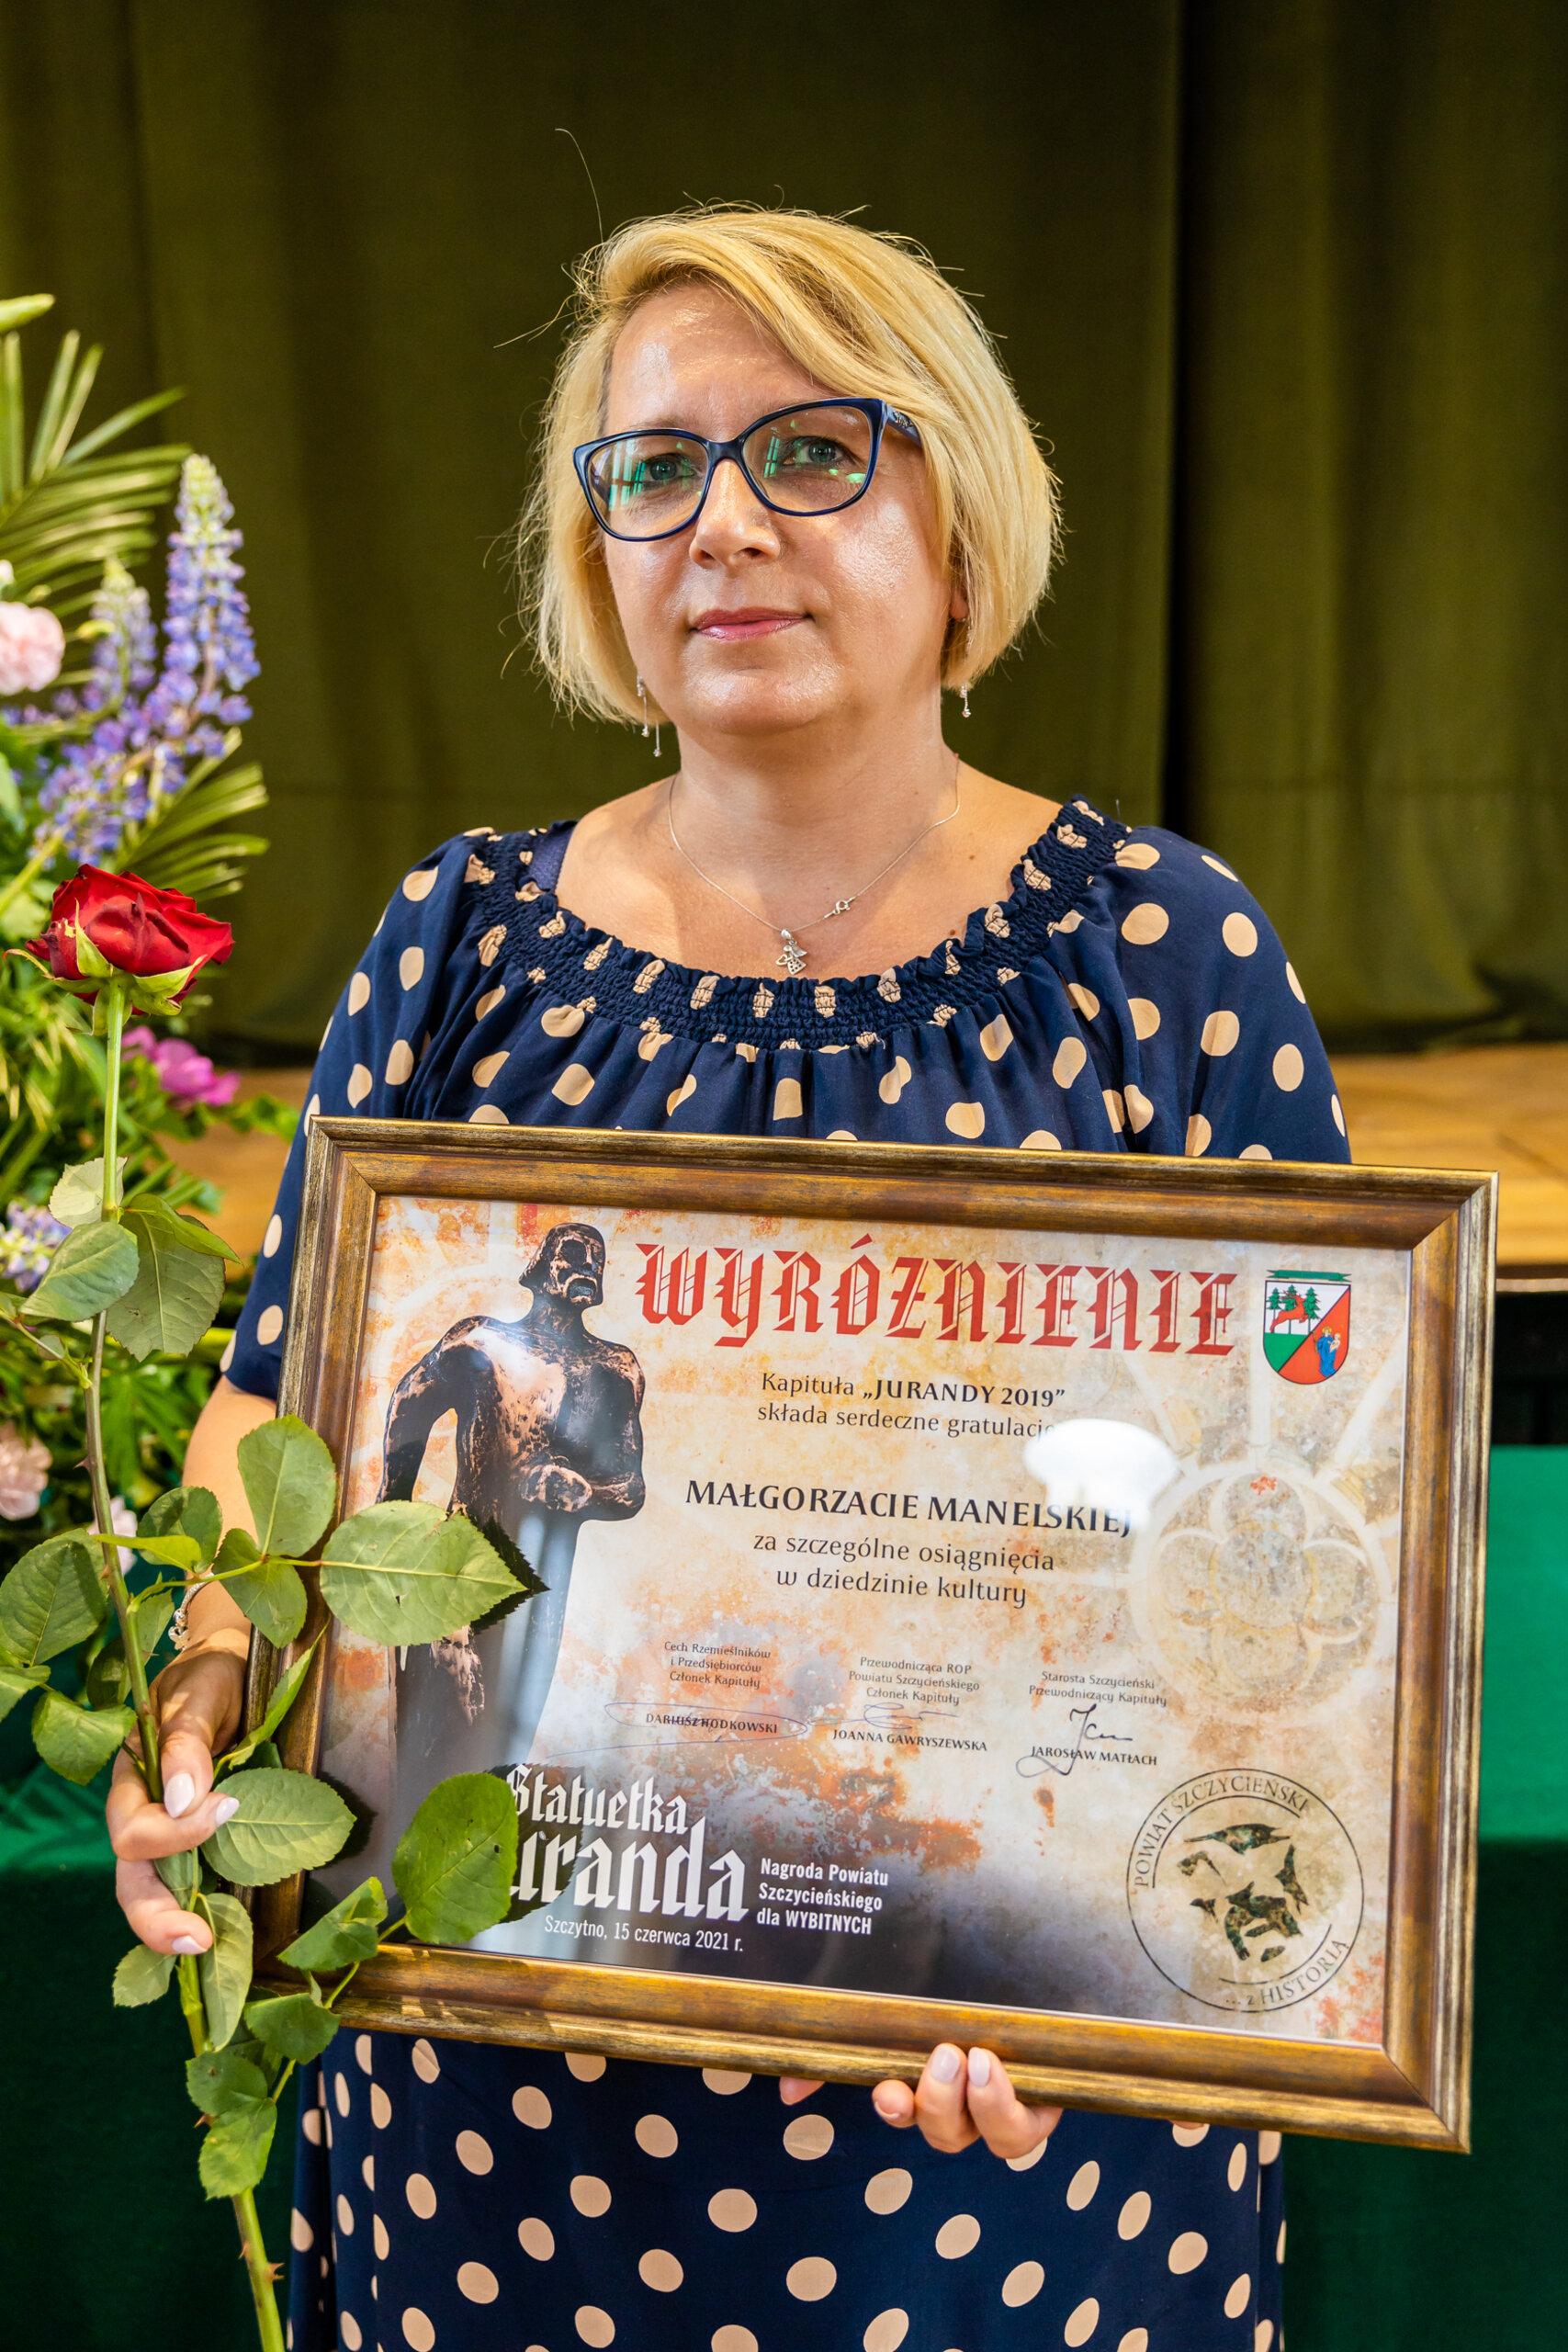 https://i.powiatszczycienski.pl/00/00/76/96/f/o8a5074-picture60c8f40d1f680.jpg